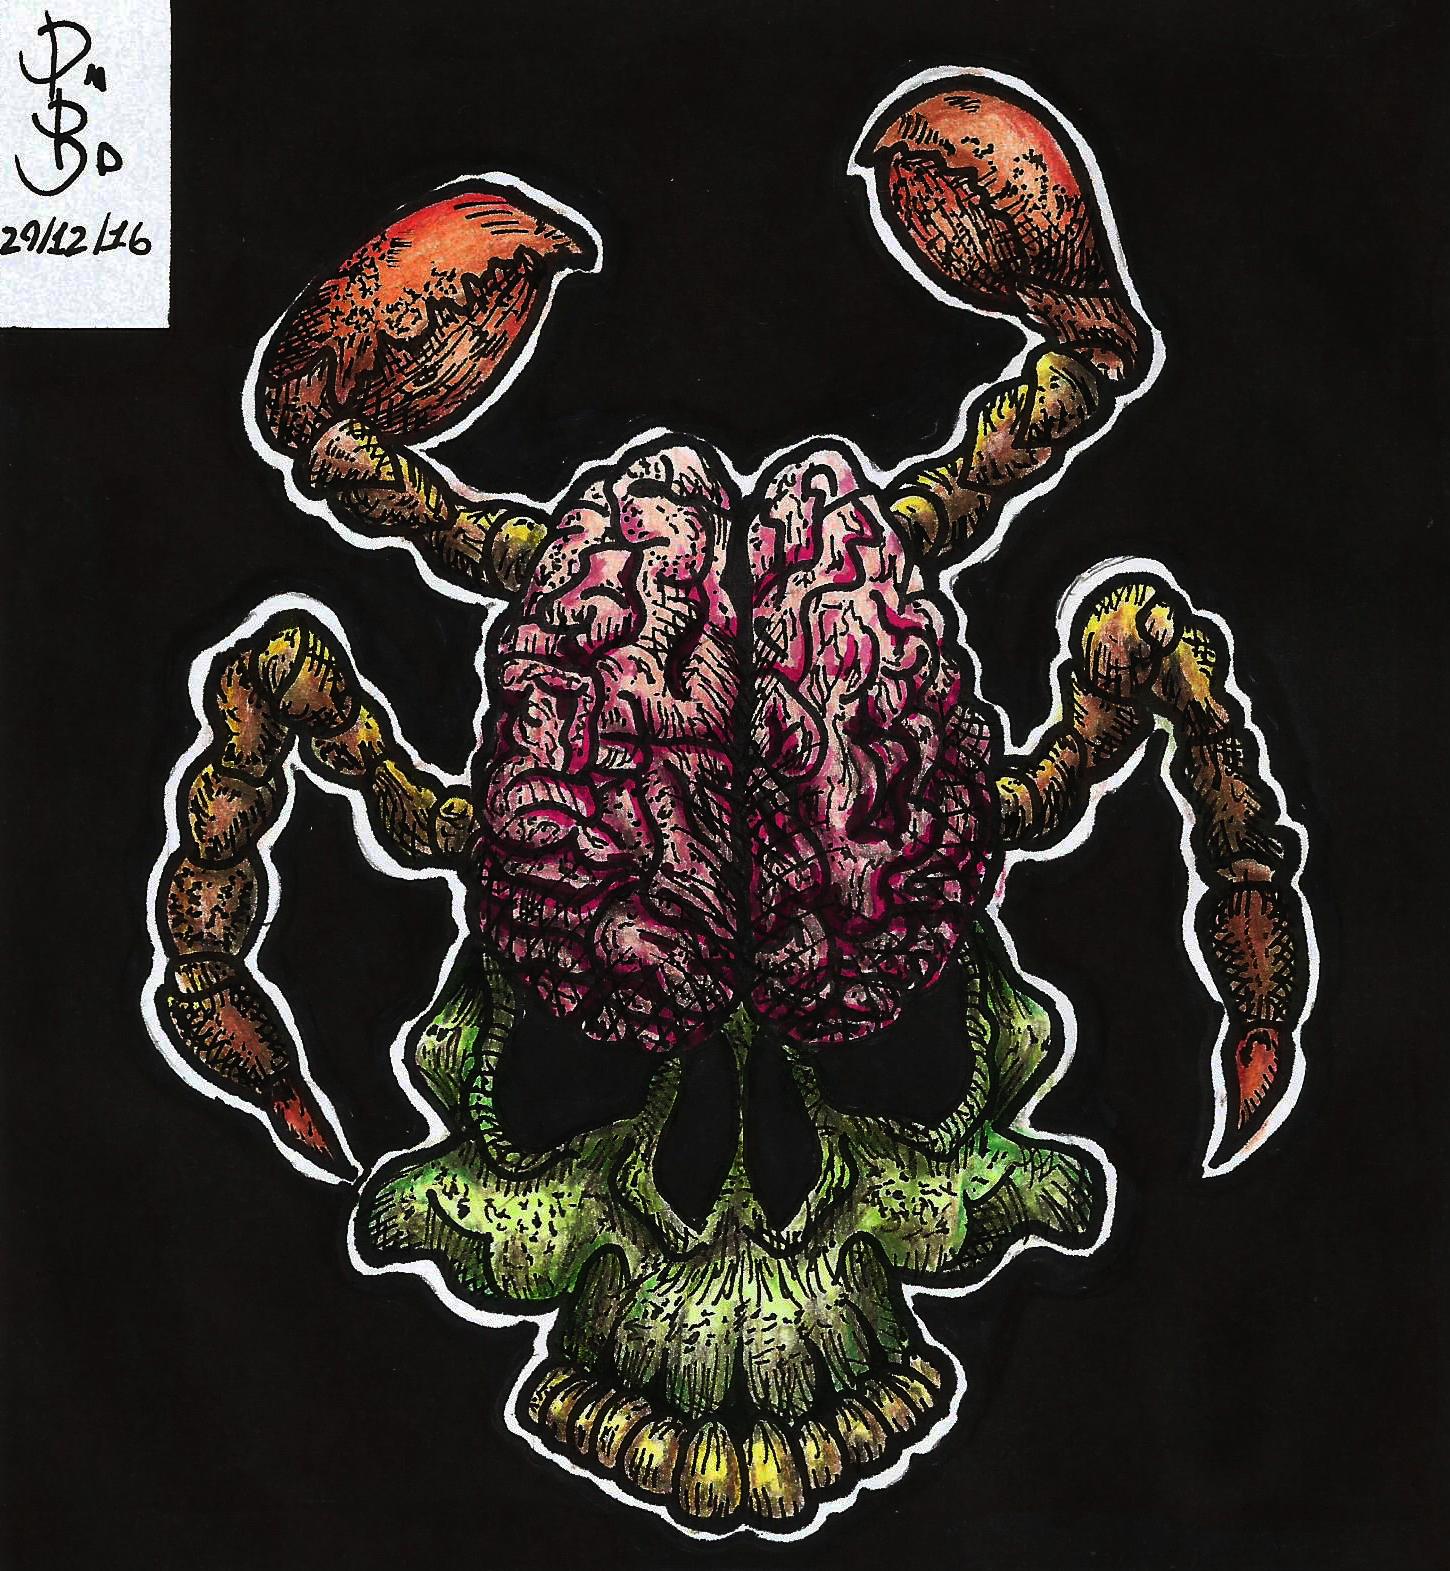 Brainparasyte